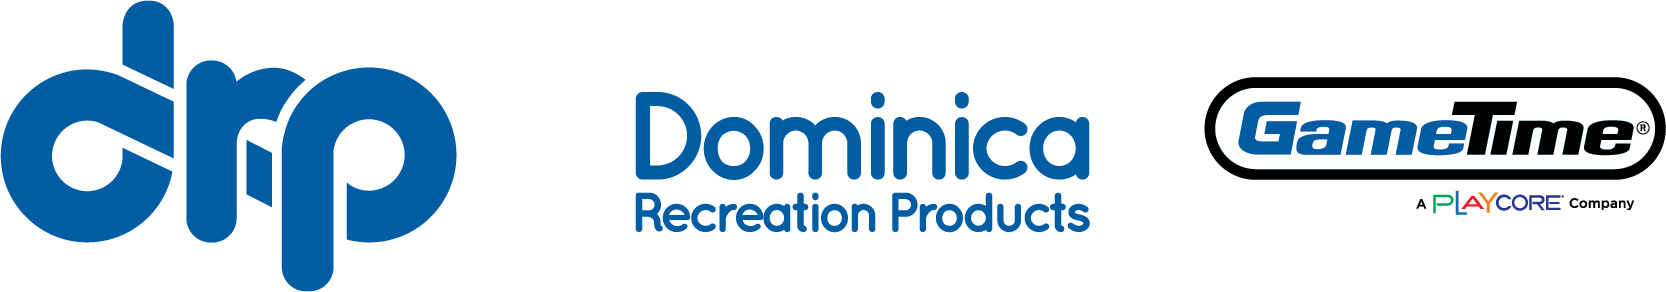 Dominica Recreation   GameTime